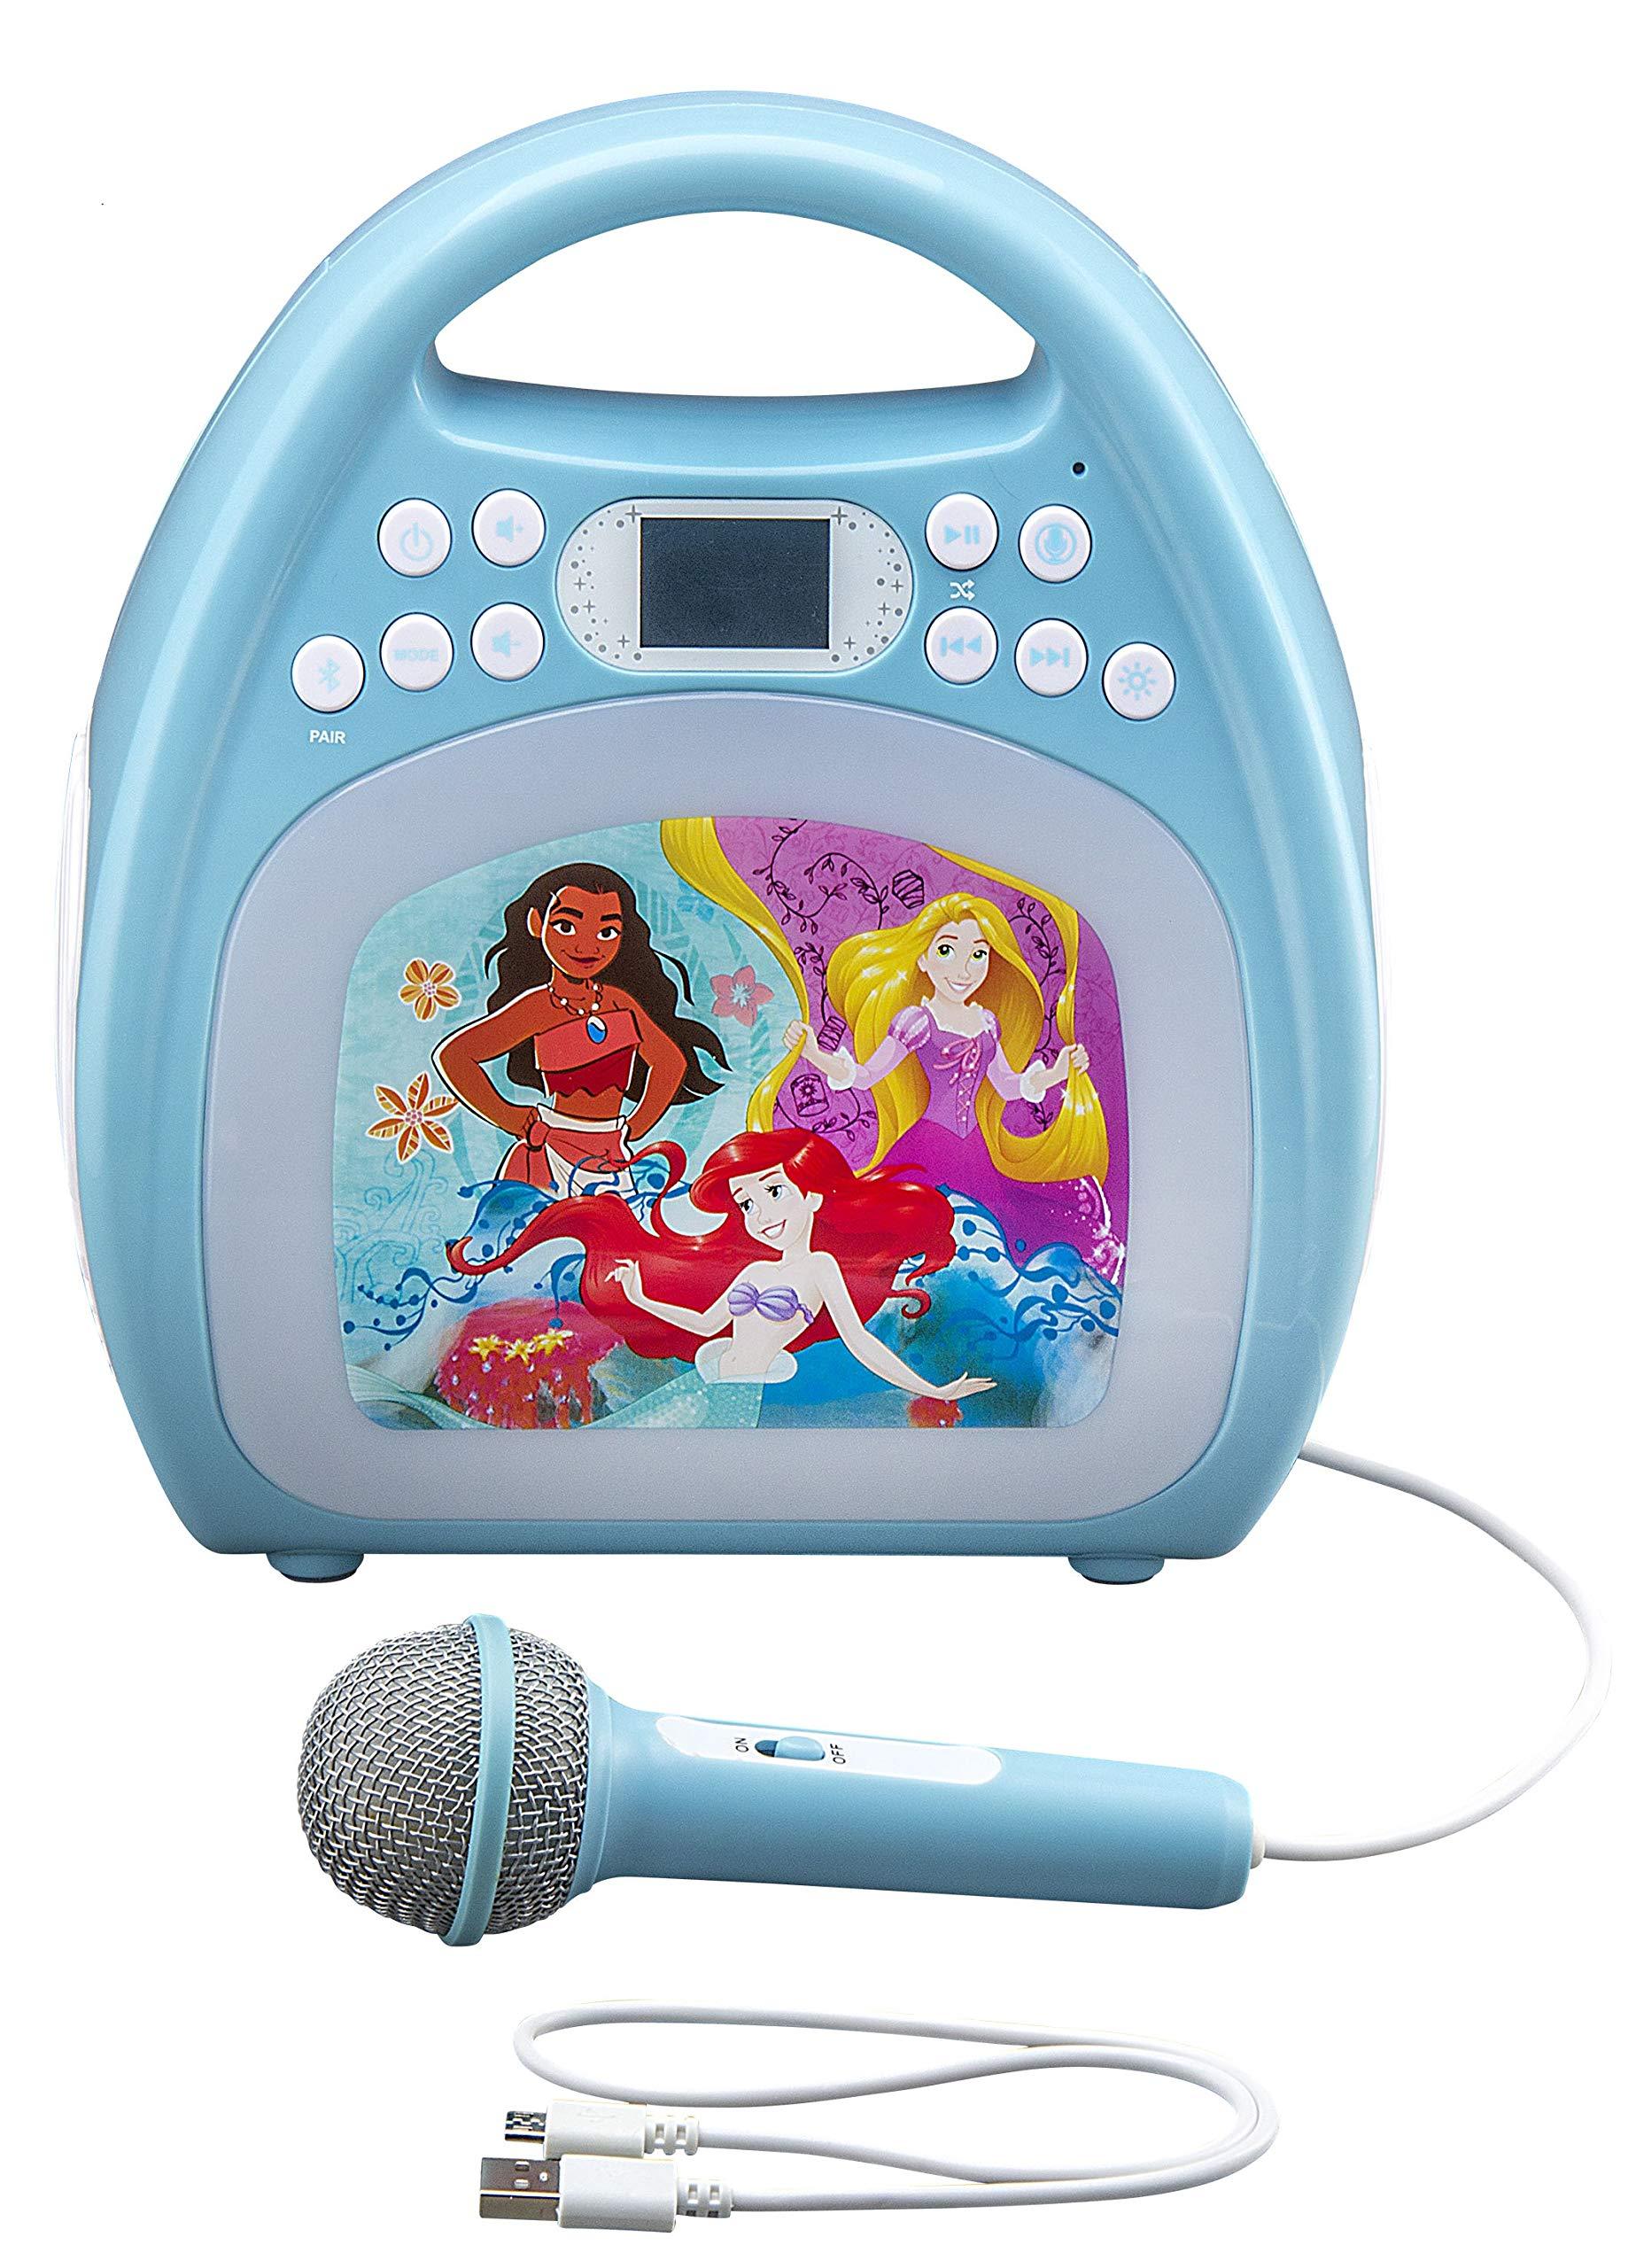 kiddesigns, inc. Disney Bluetooth MP3 Karaoke with Light Show - Disney Princesses by kiddesigns, inc. (Image #1)